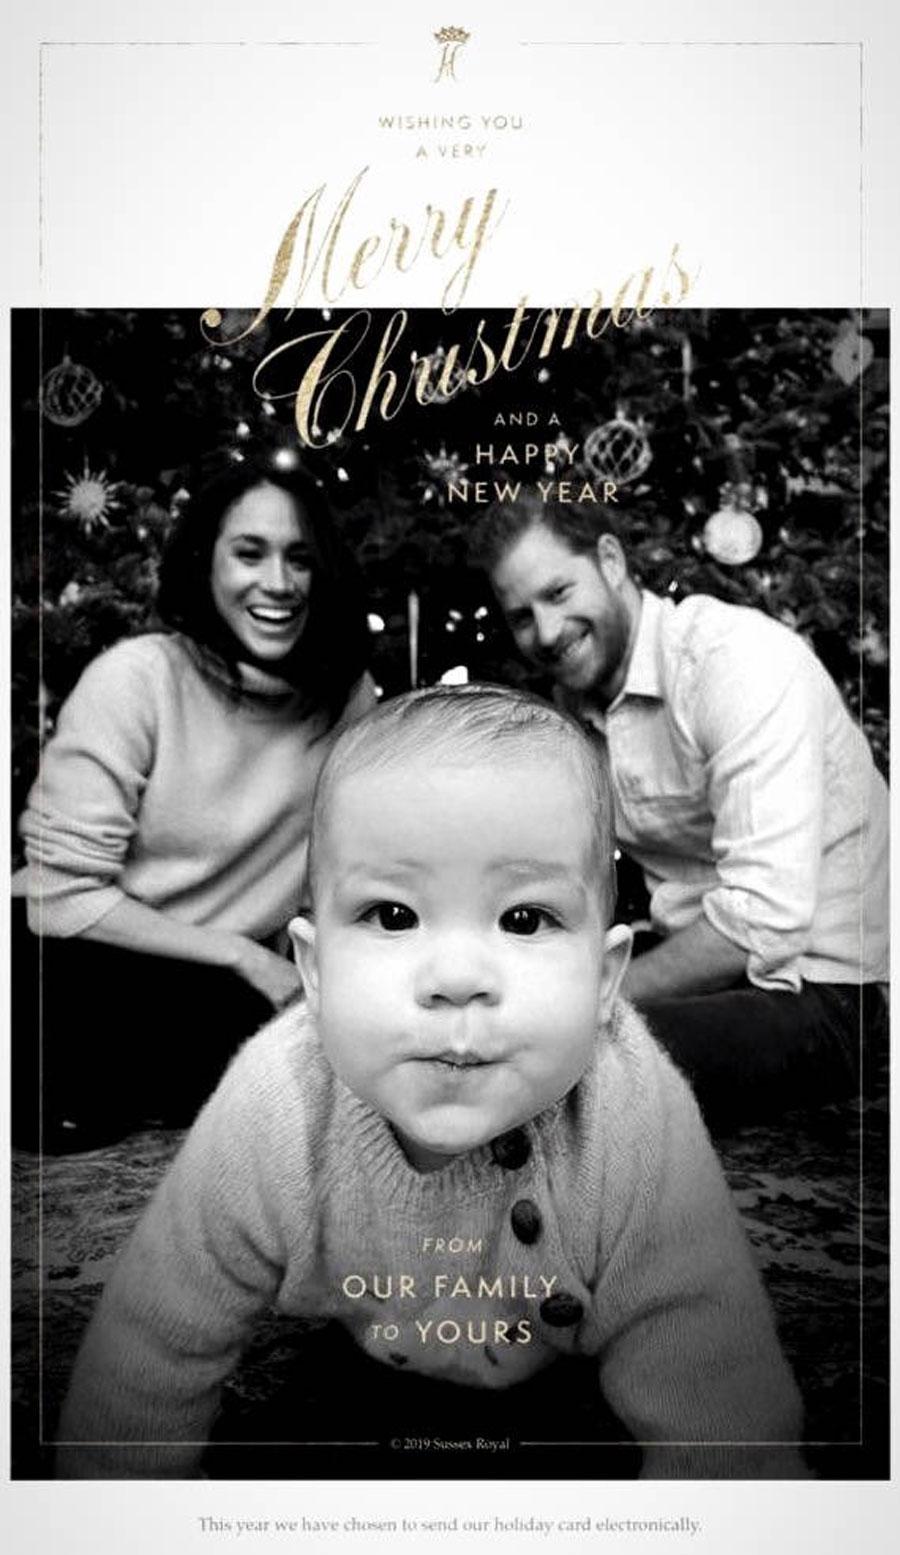 Prince Harry and Meghan Markle's Christmas Card Will Melt Your Heart